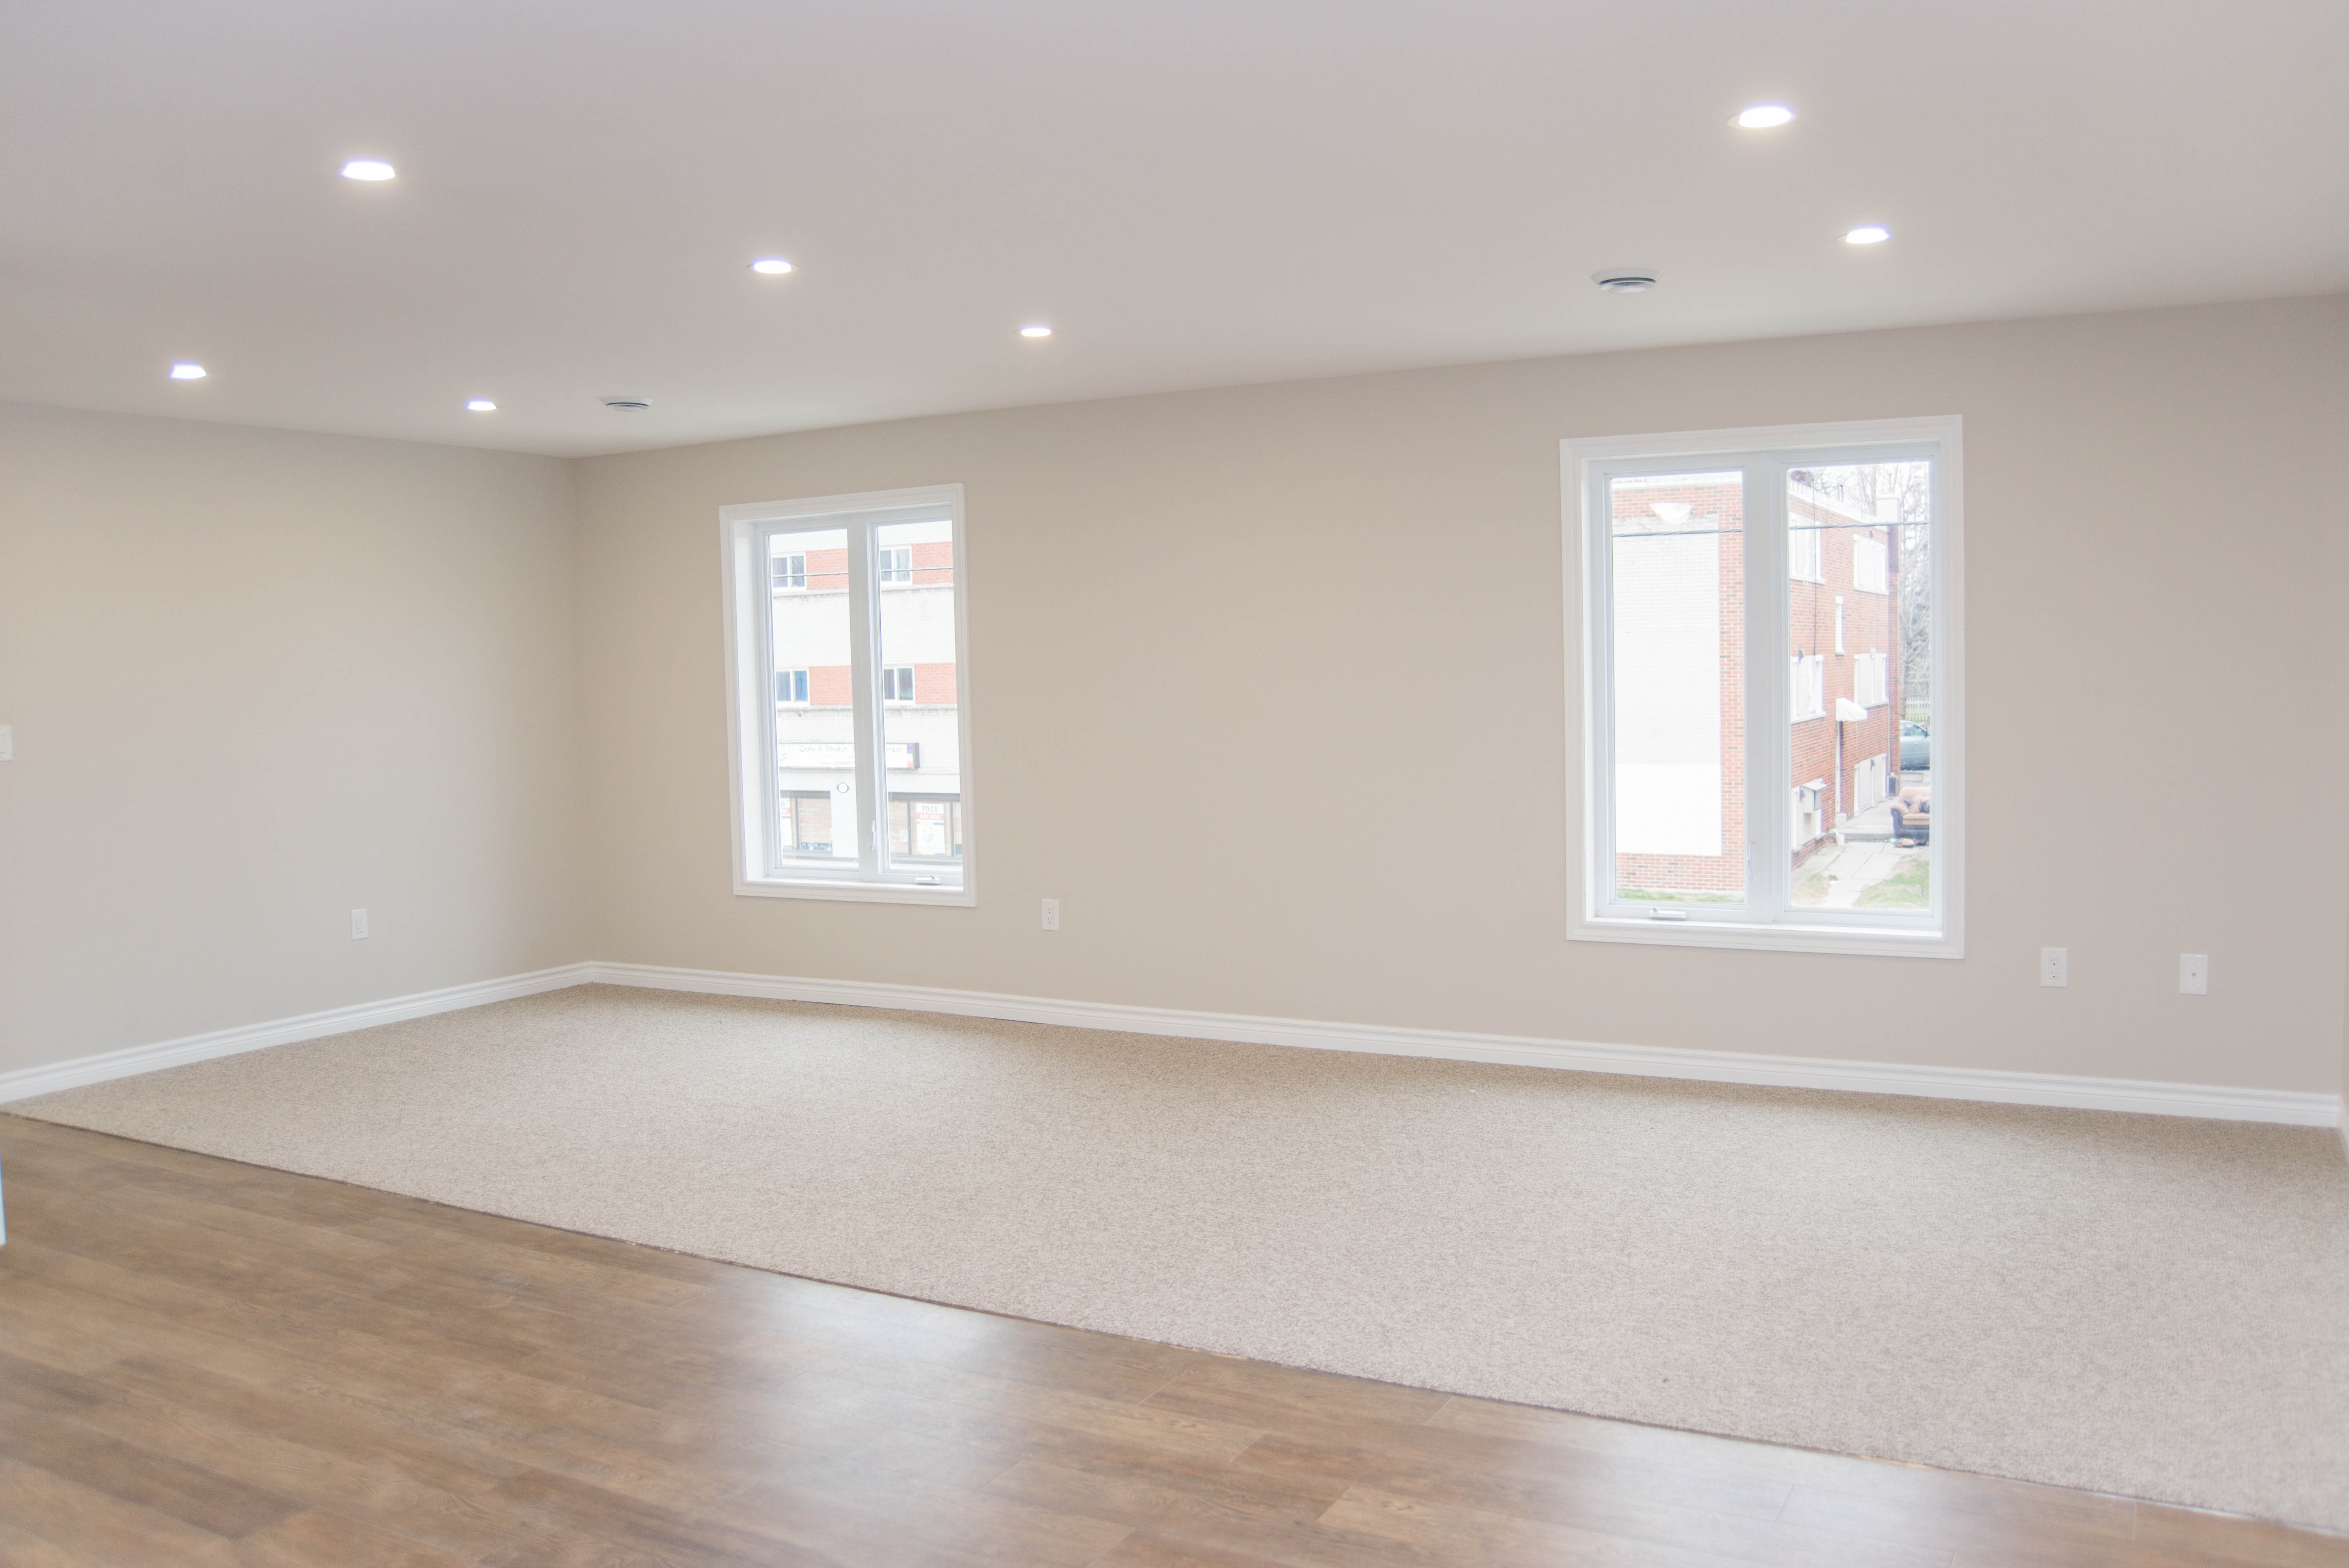 3 Bedroom - Living Space